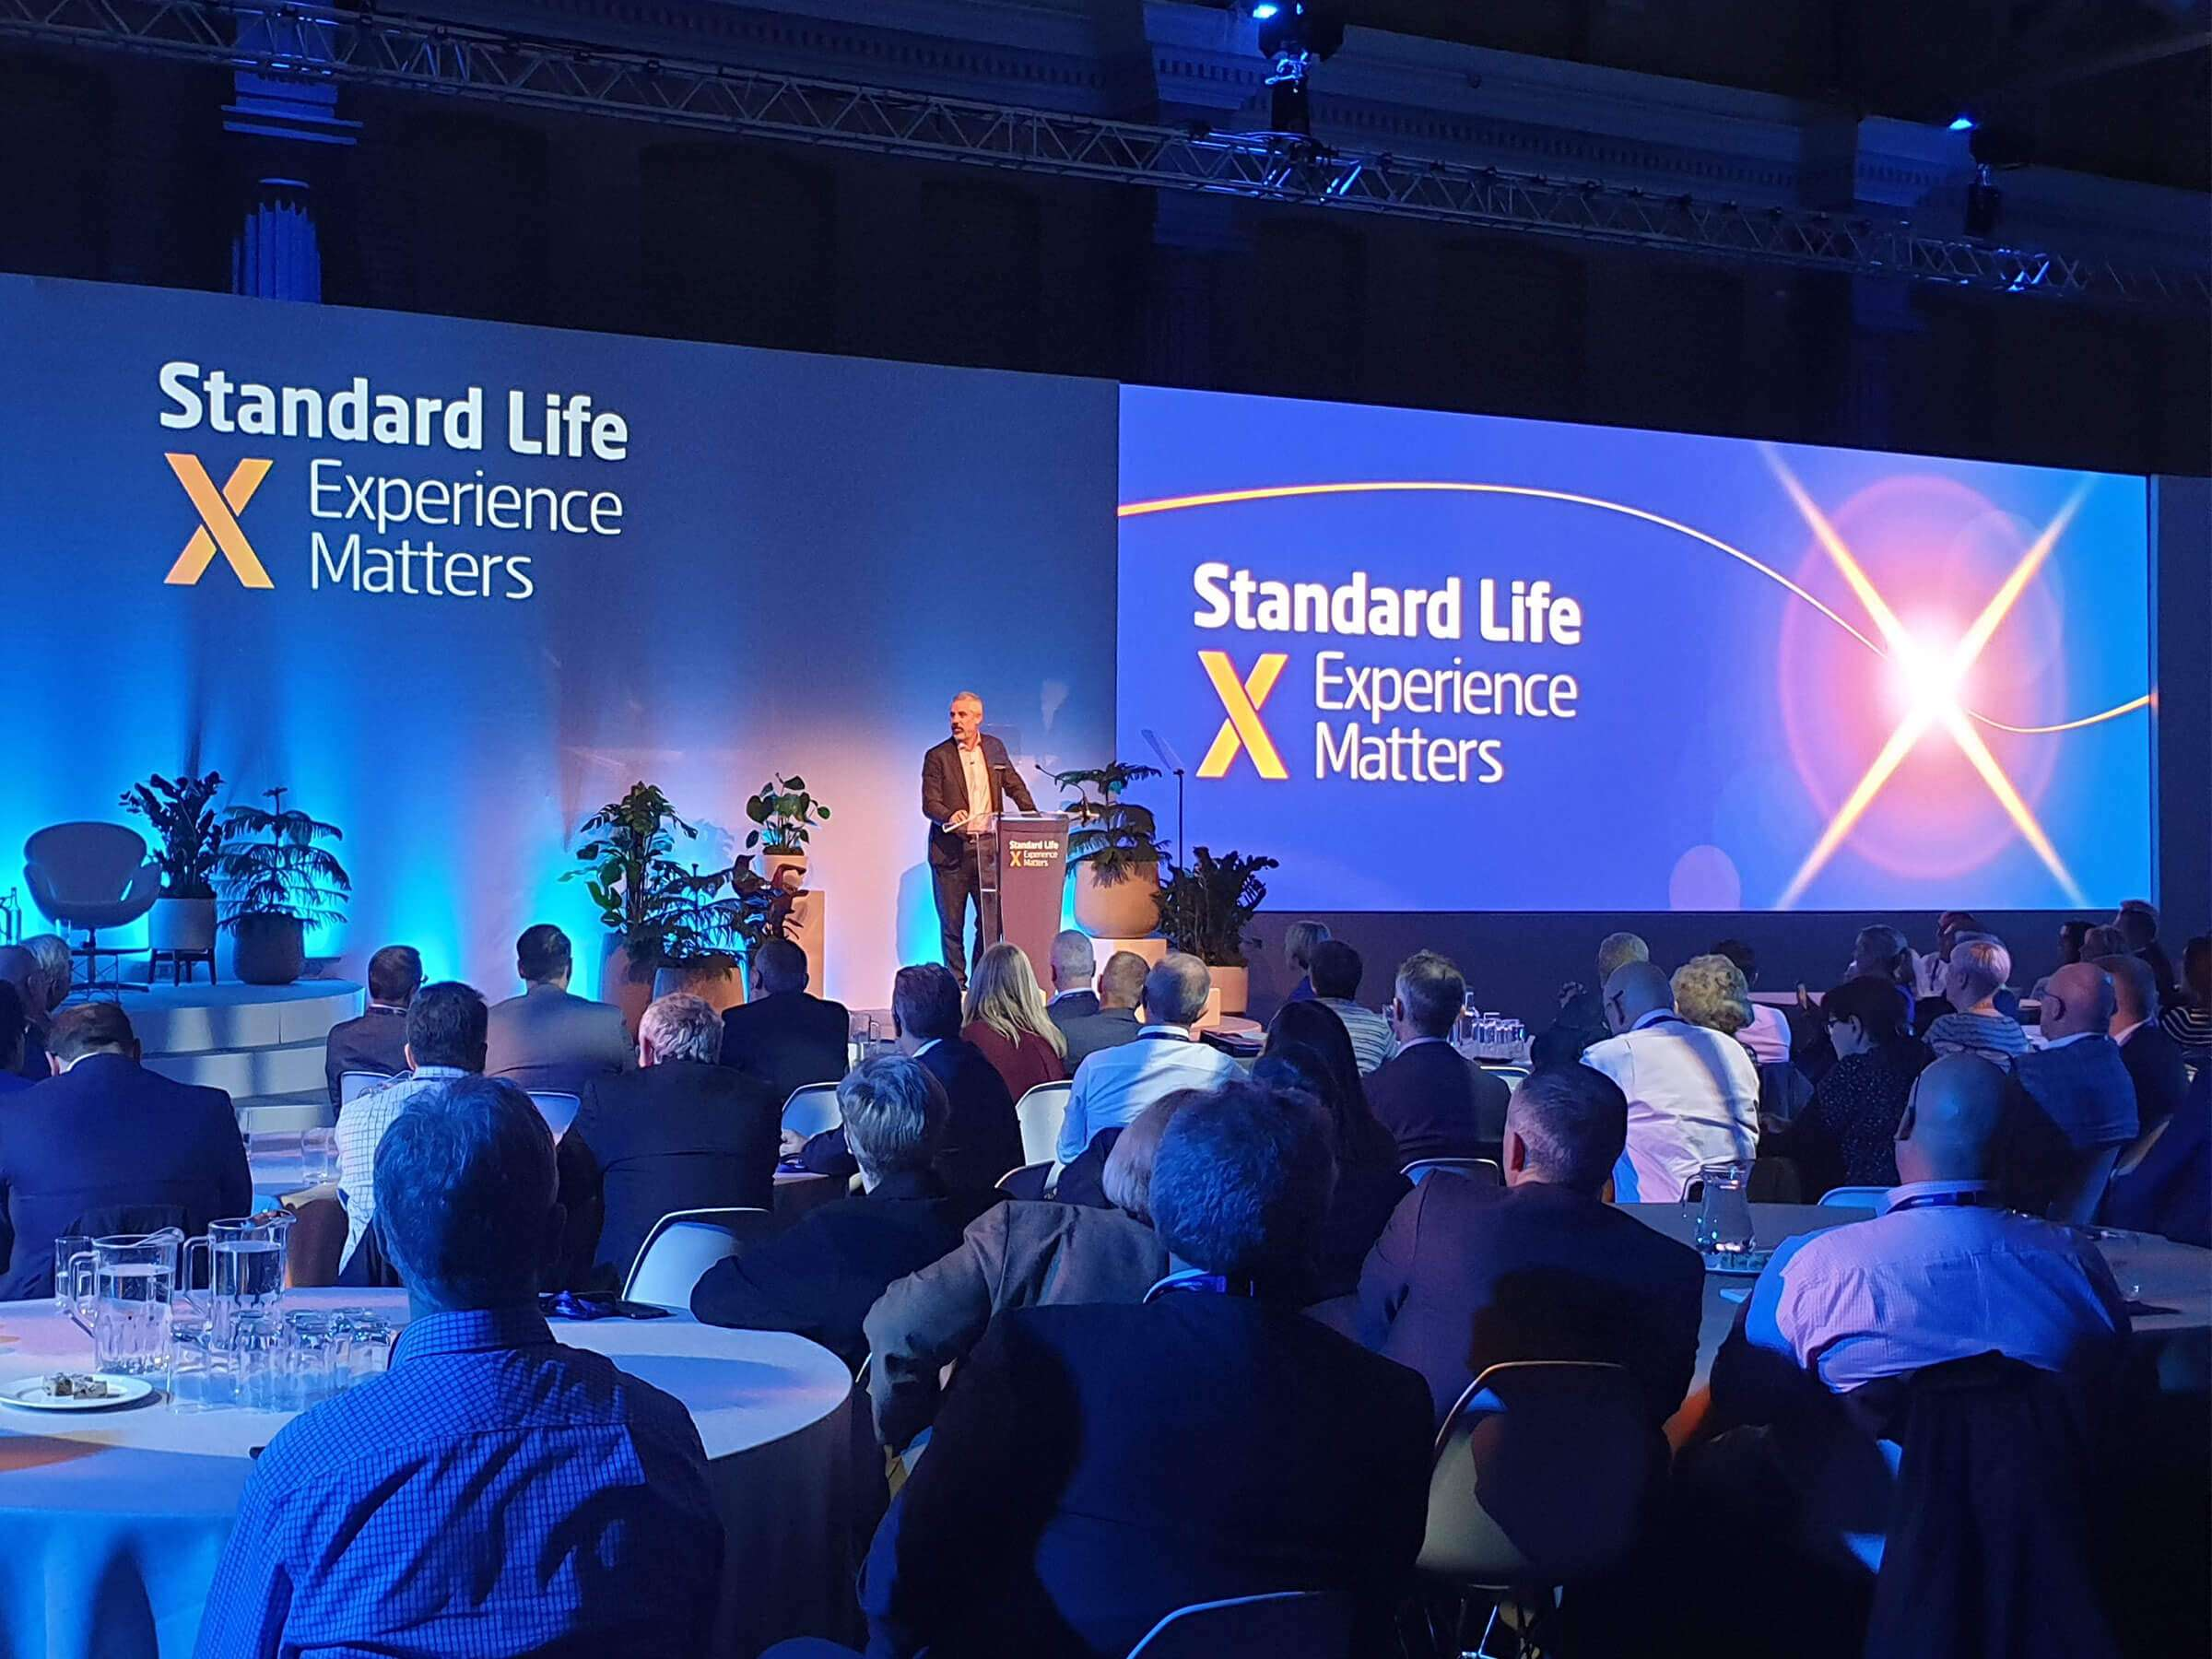 Standard-Life_image_04